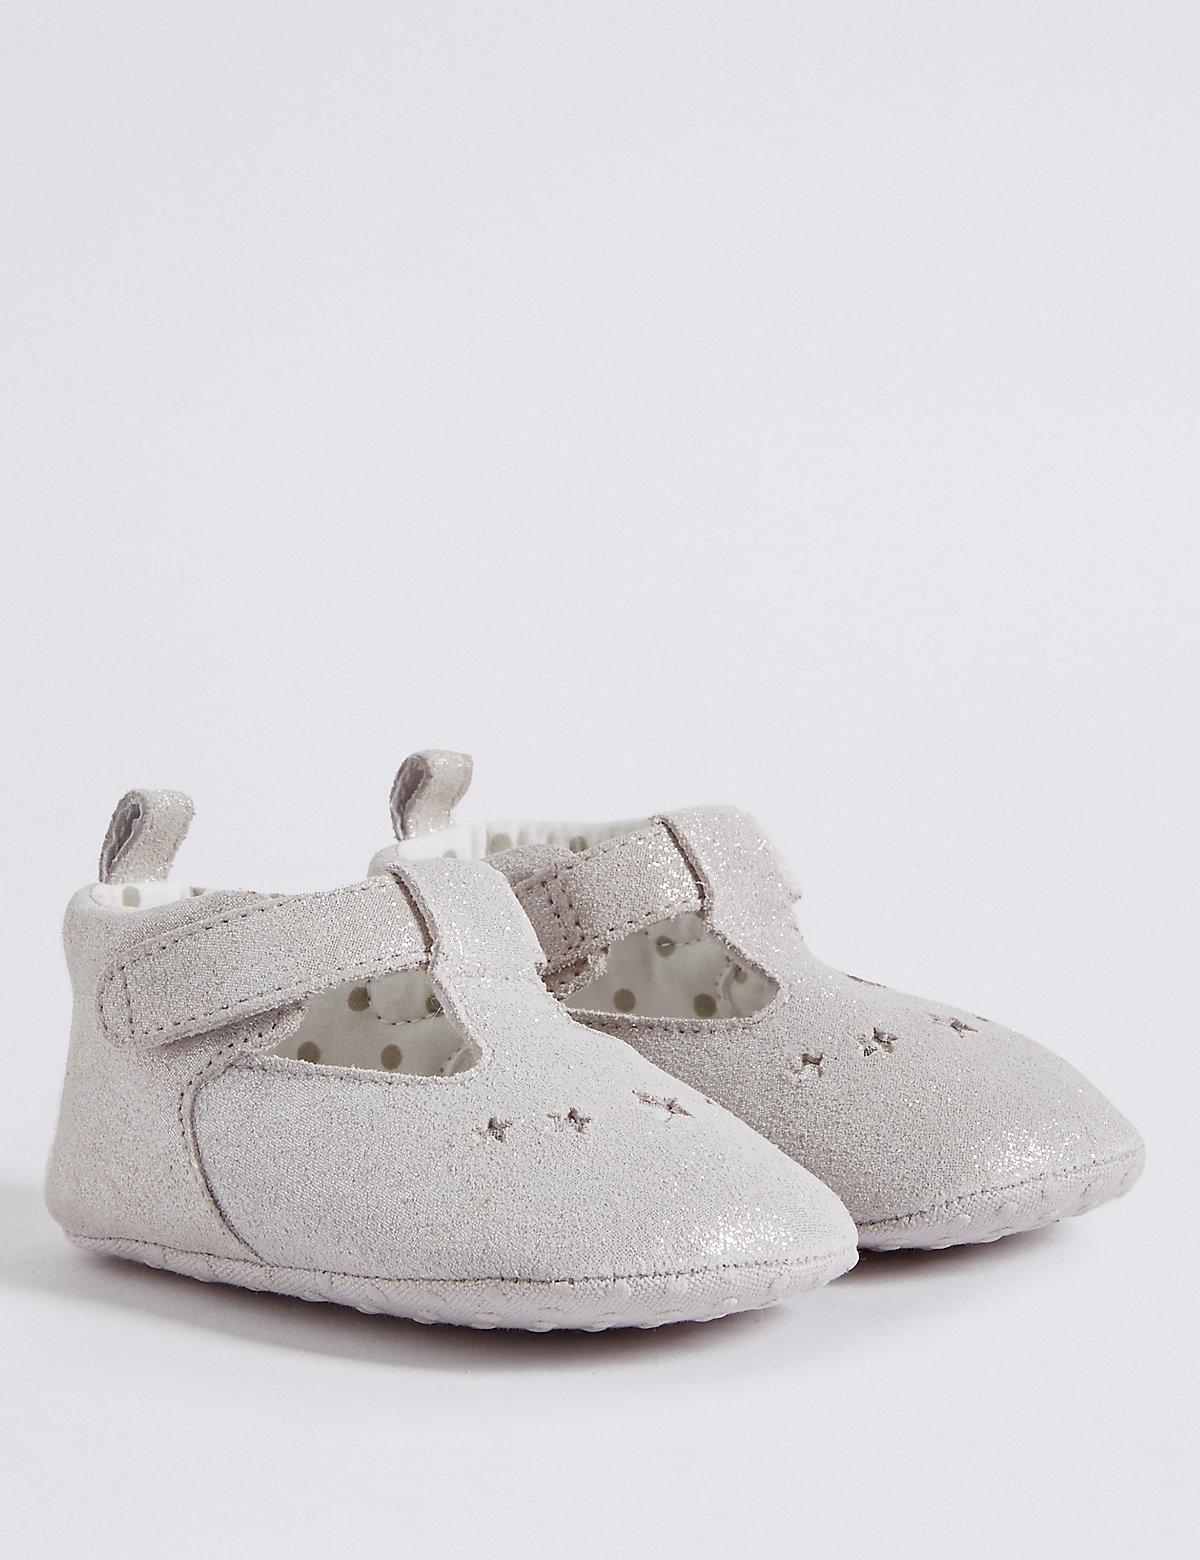 Baby Suede Riptape Pram Shoes